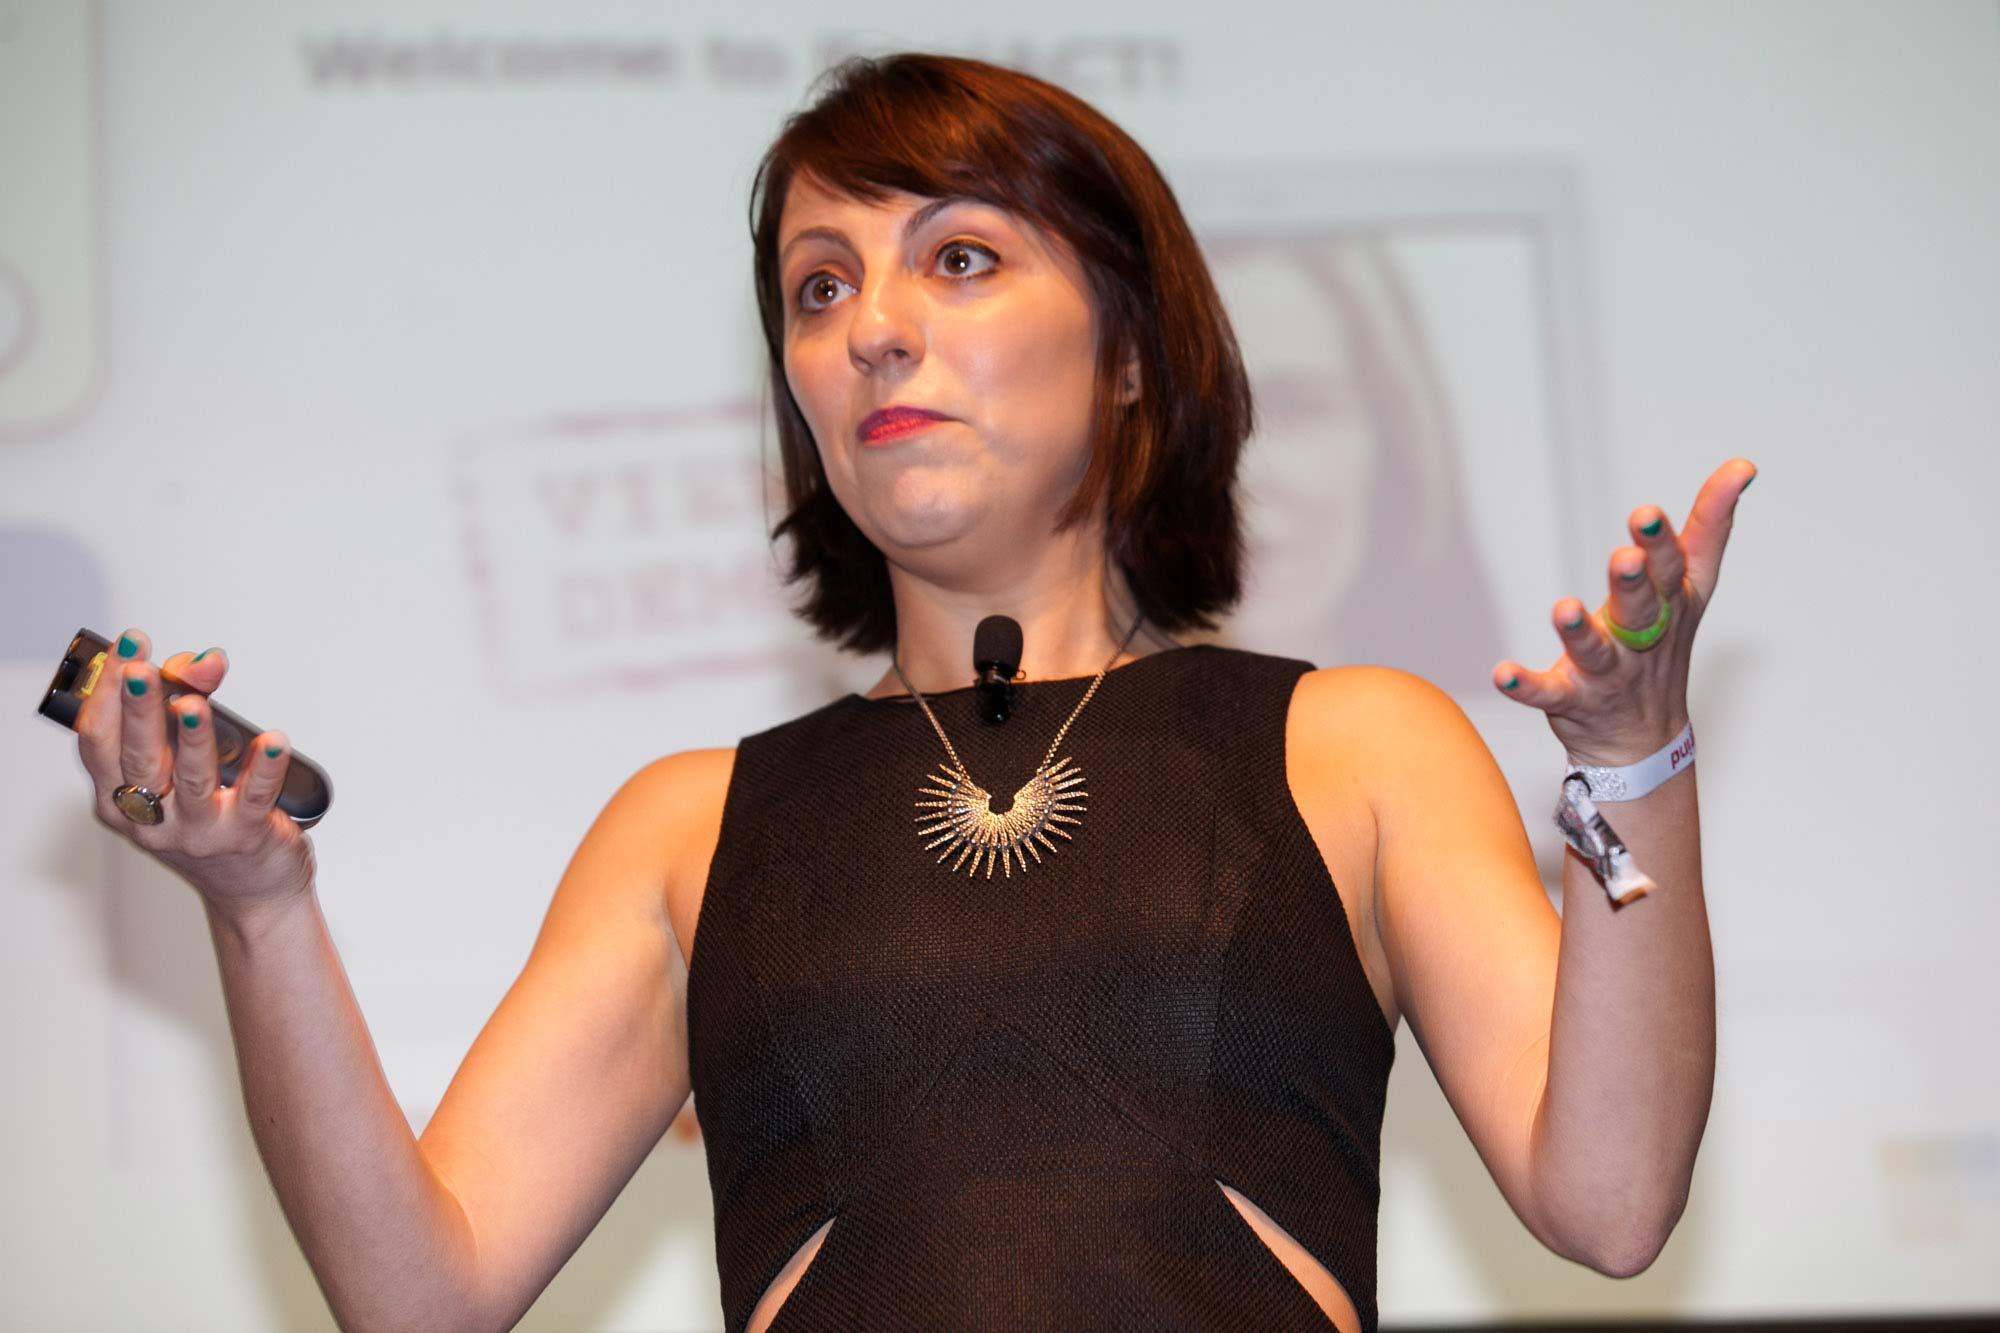 Deena Varshavskaya, Wanelo, at Startup Grind 2014